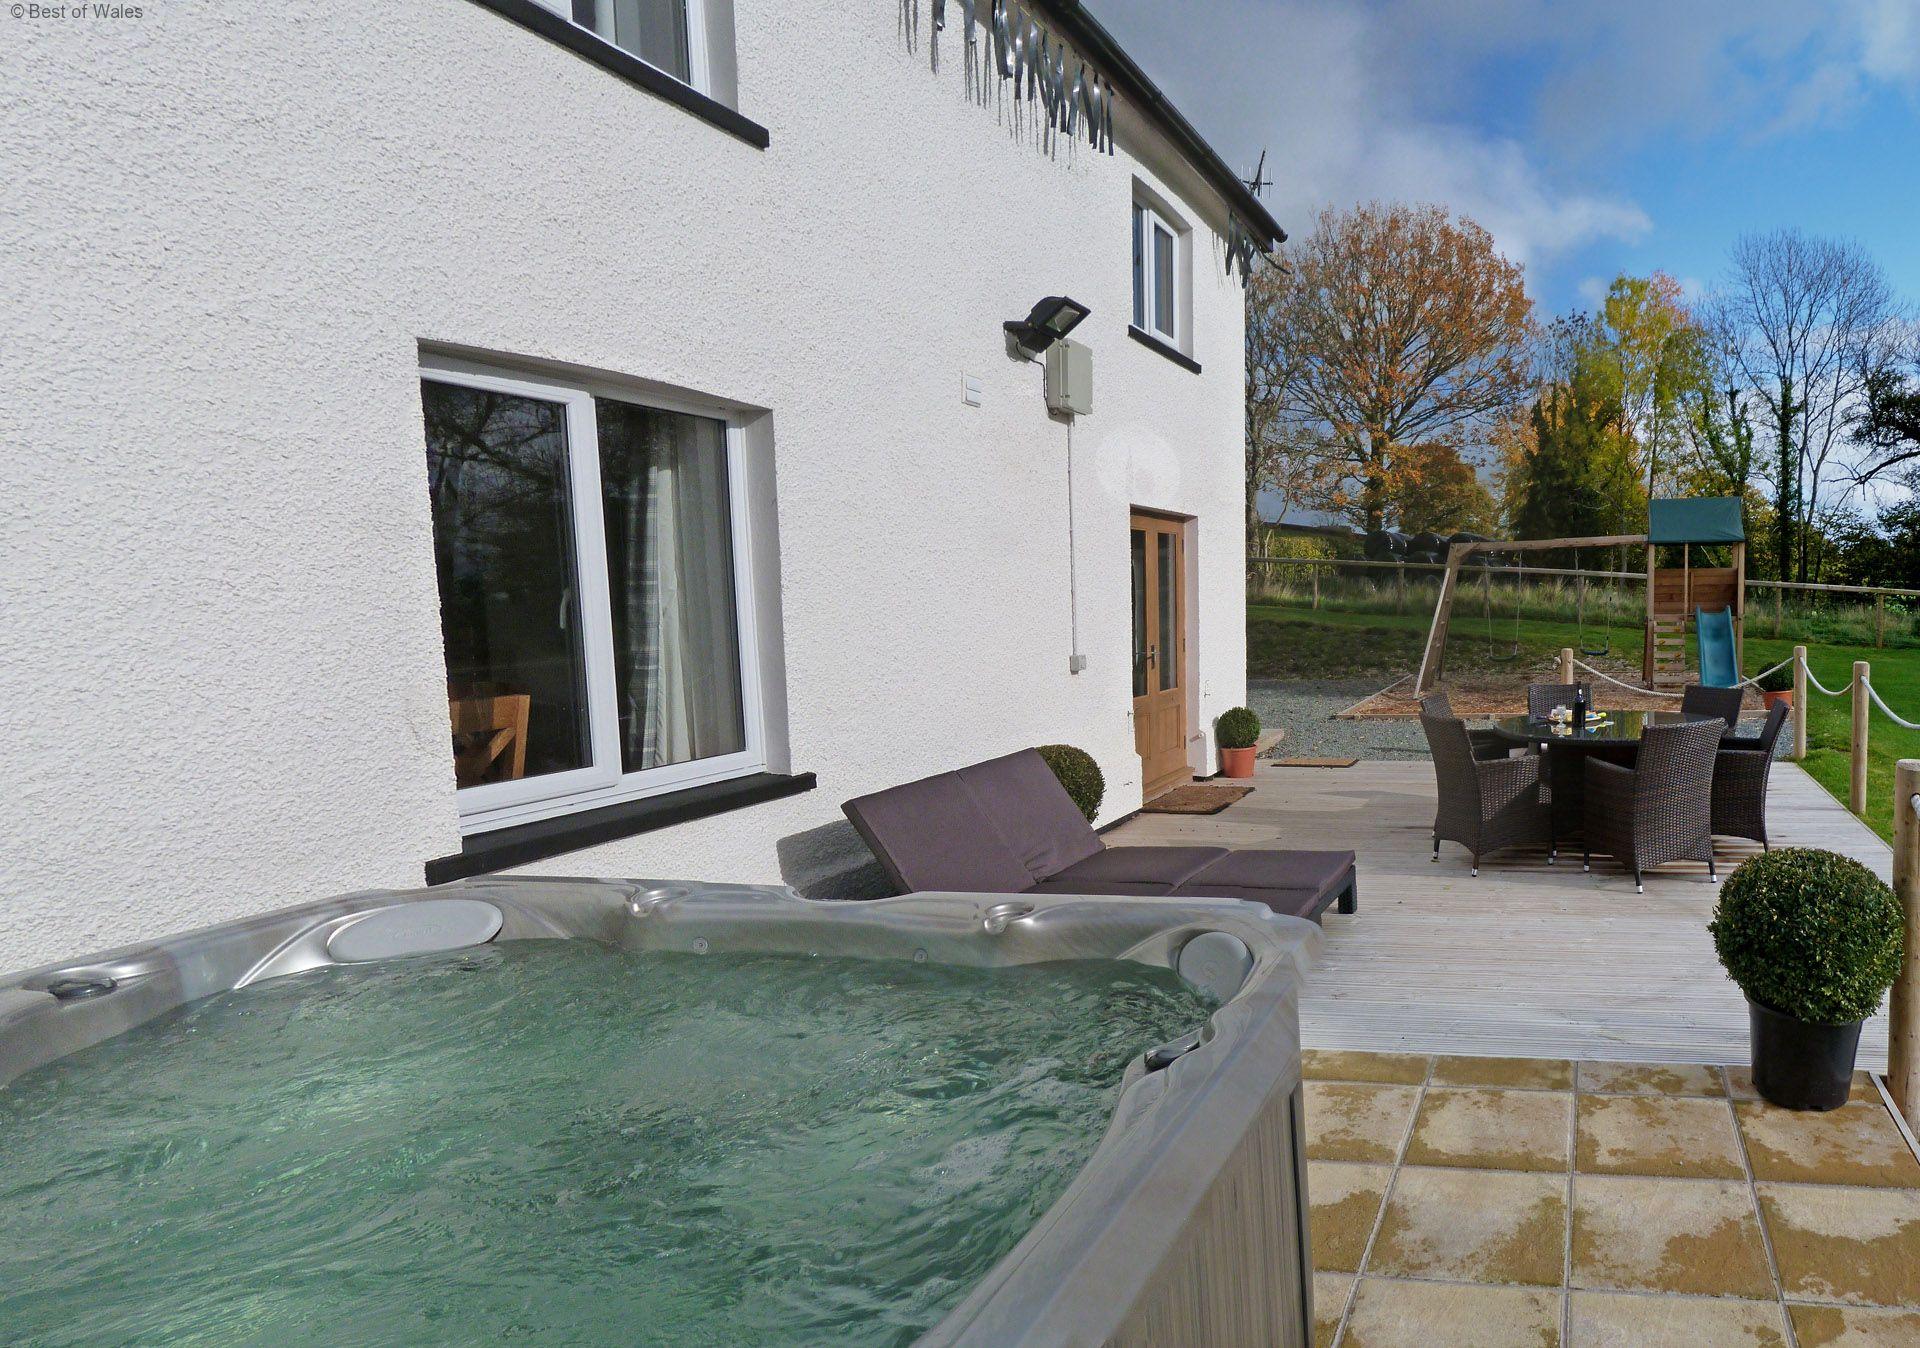 5 star luxury farmhouse with hot tub for Luxury hot tub